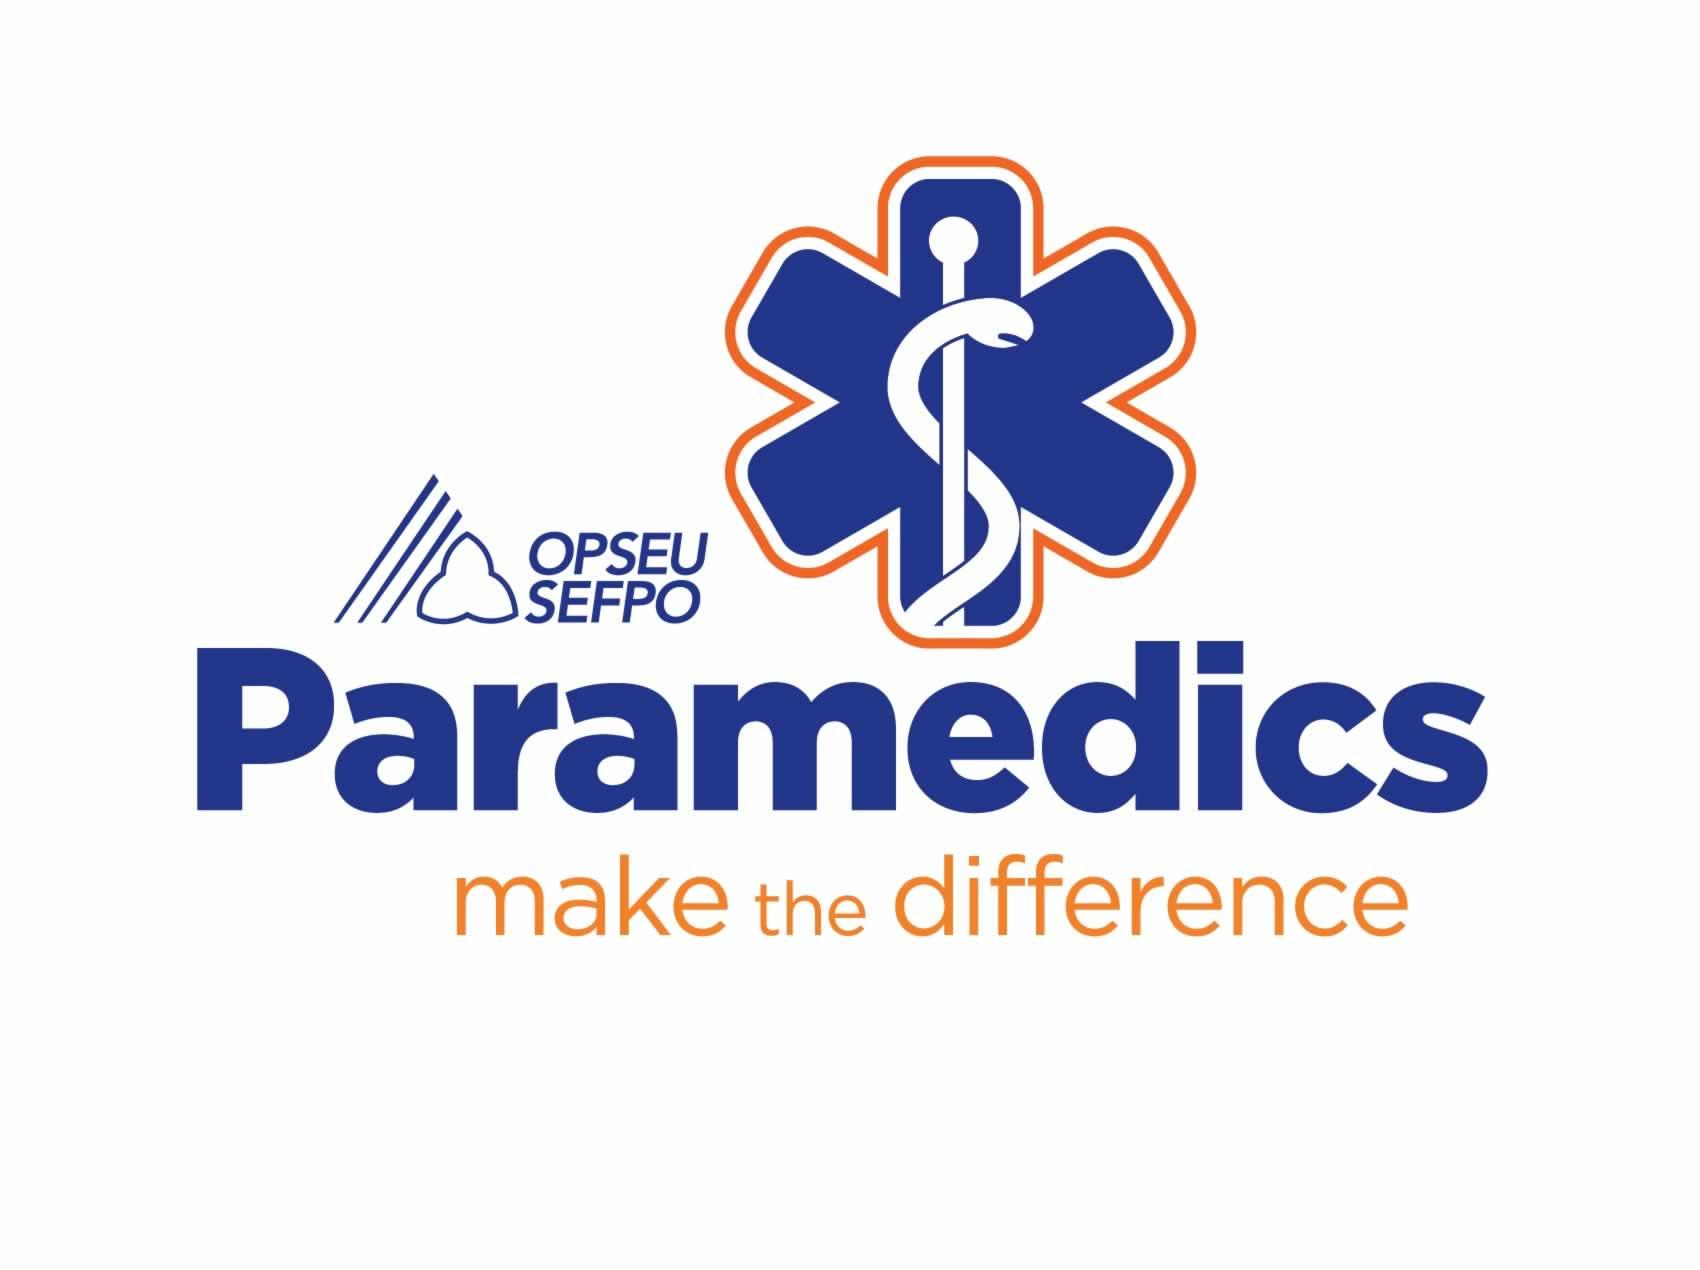 OPSEU Paramedics make the difference